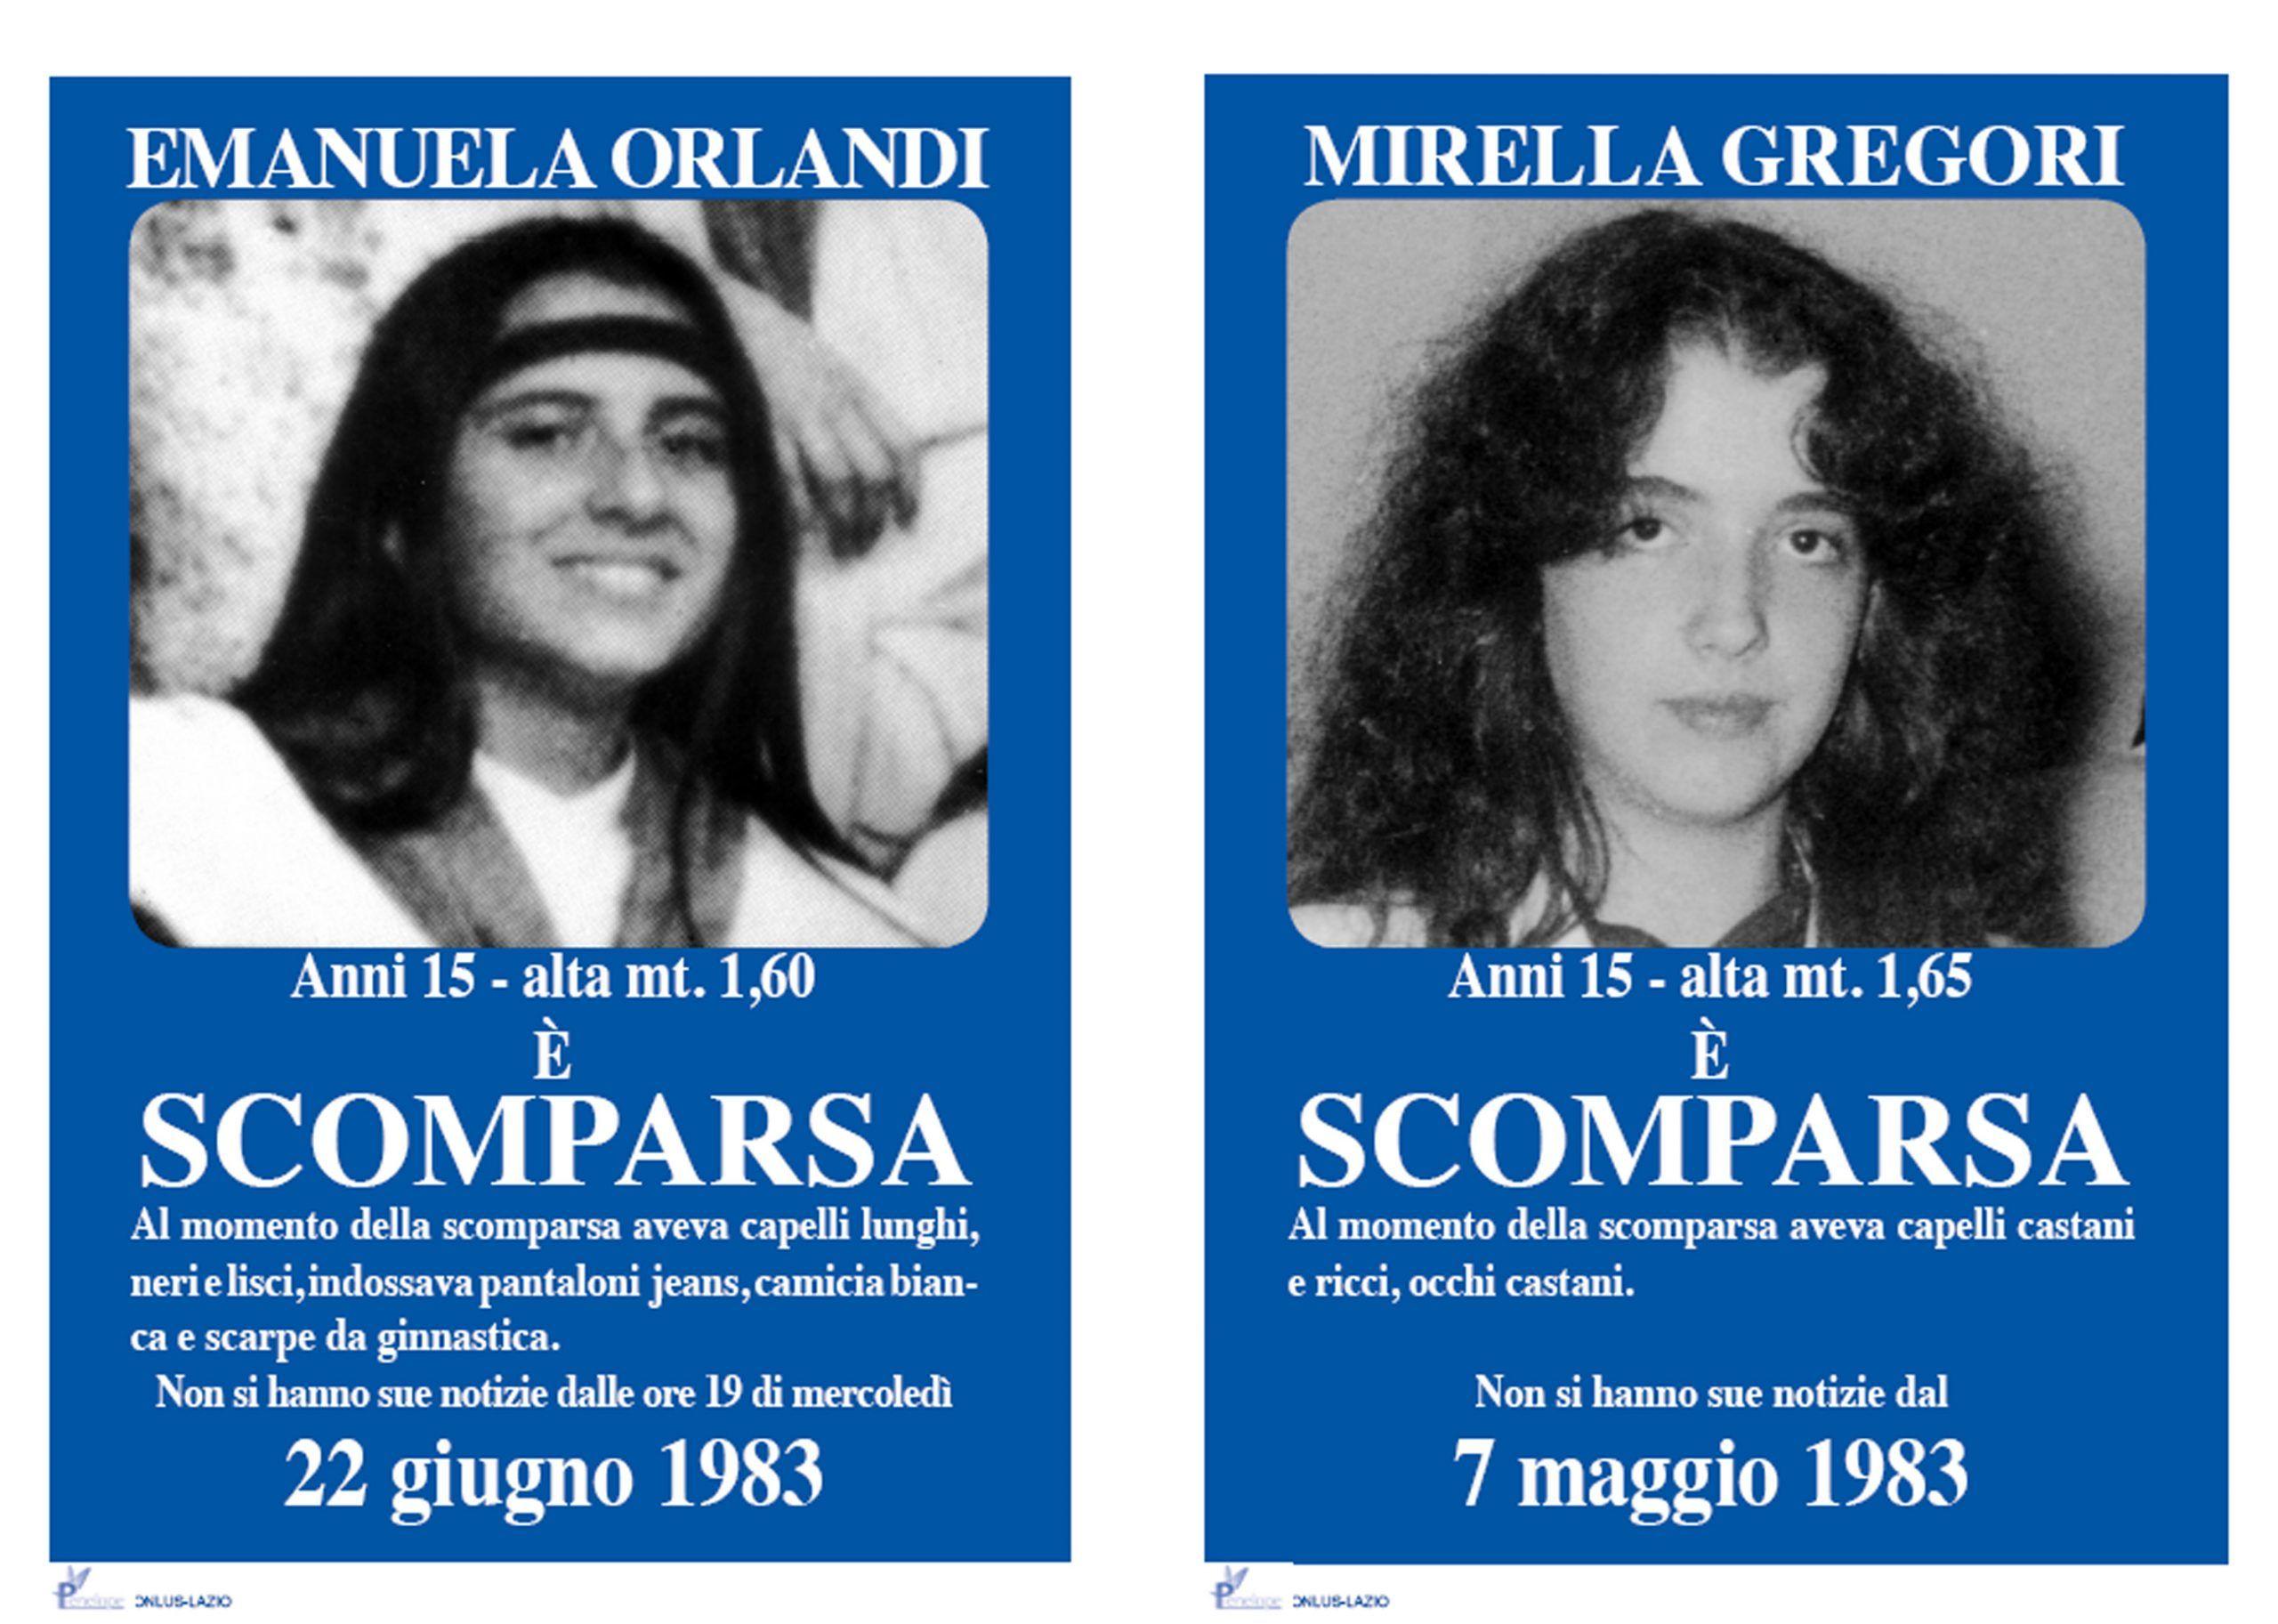 Emanuela Orlandi: ossa umane trovate in Vaticano, si indaga per omicidio